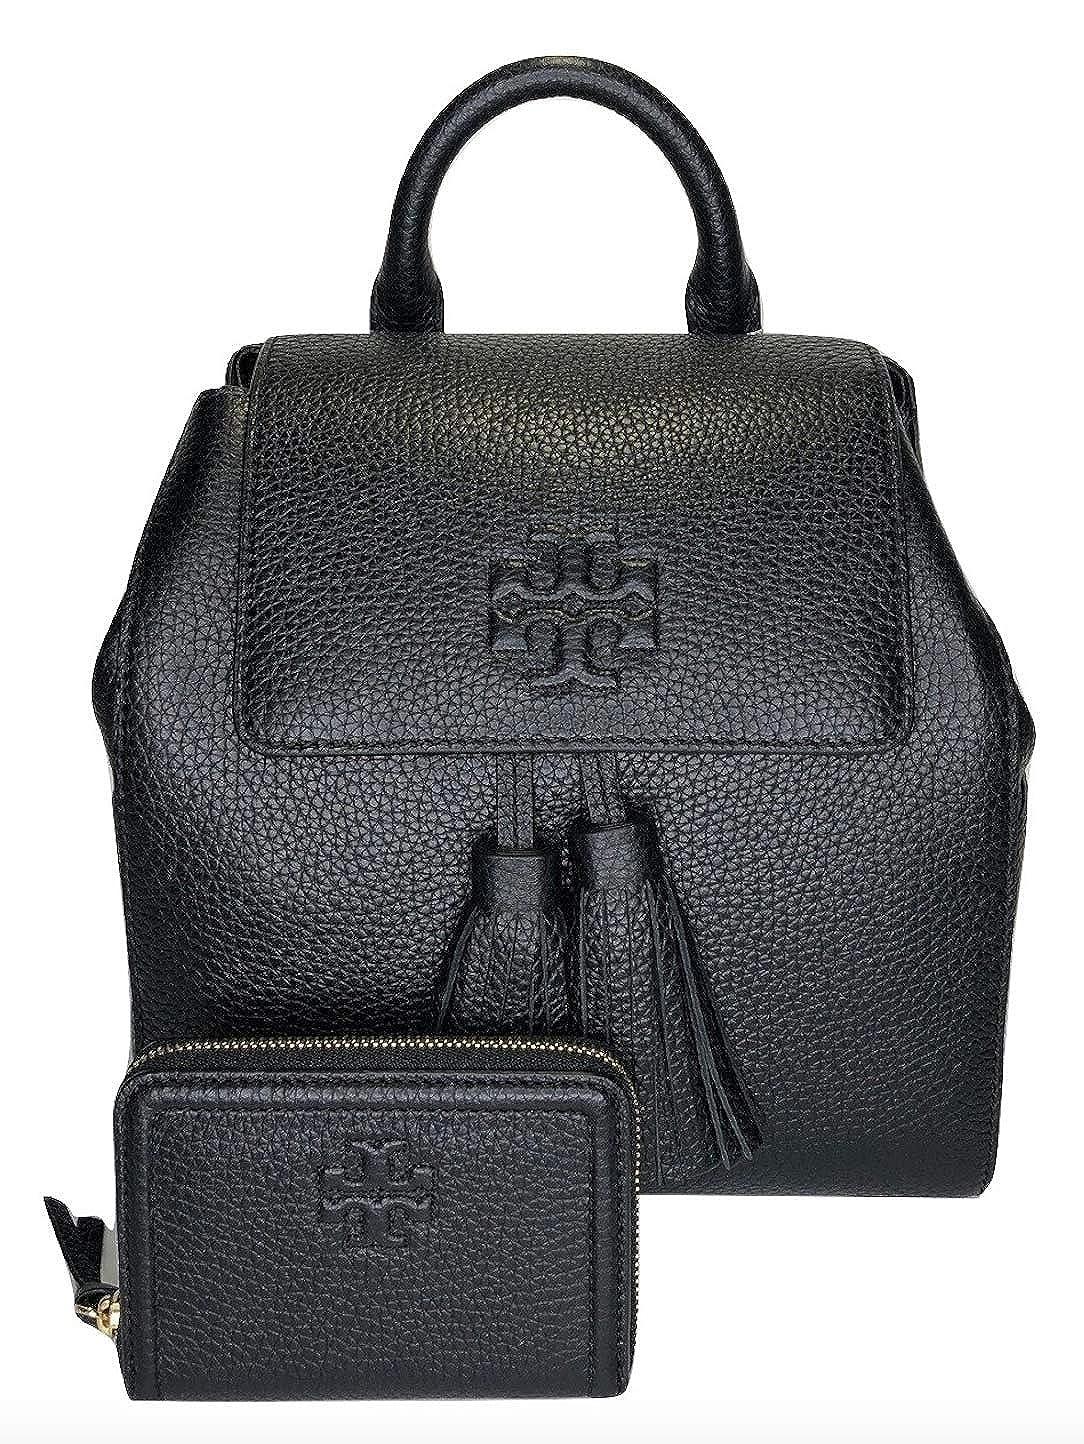 7d465c796fa Amazon.com: Tory Burch Thea Mini Backpack bundled with Tory Burch ...